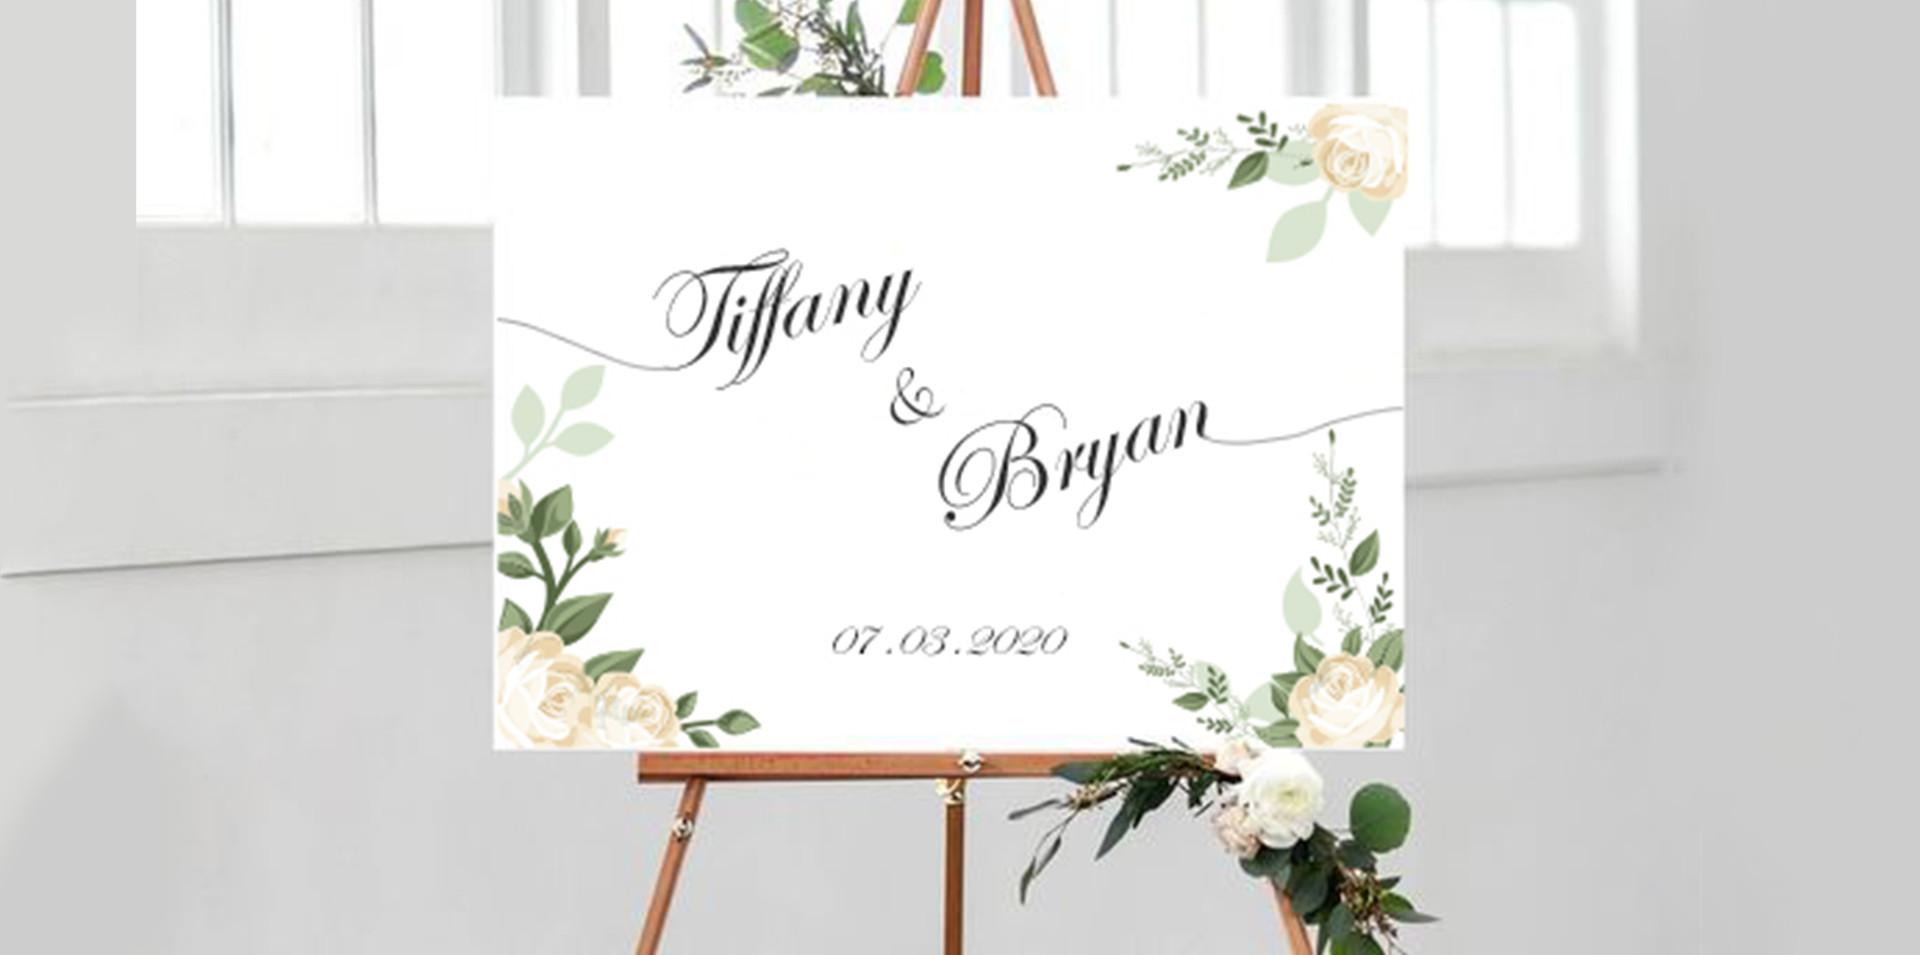 Special Ocassions Wedding Introducing Board